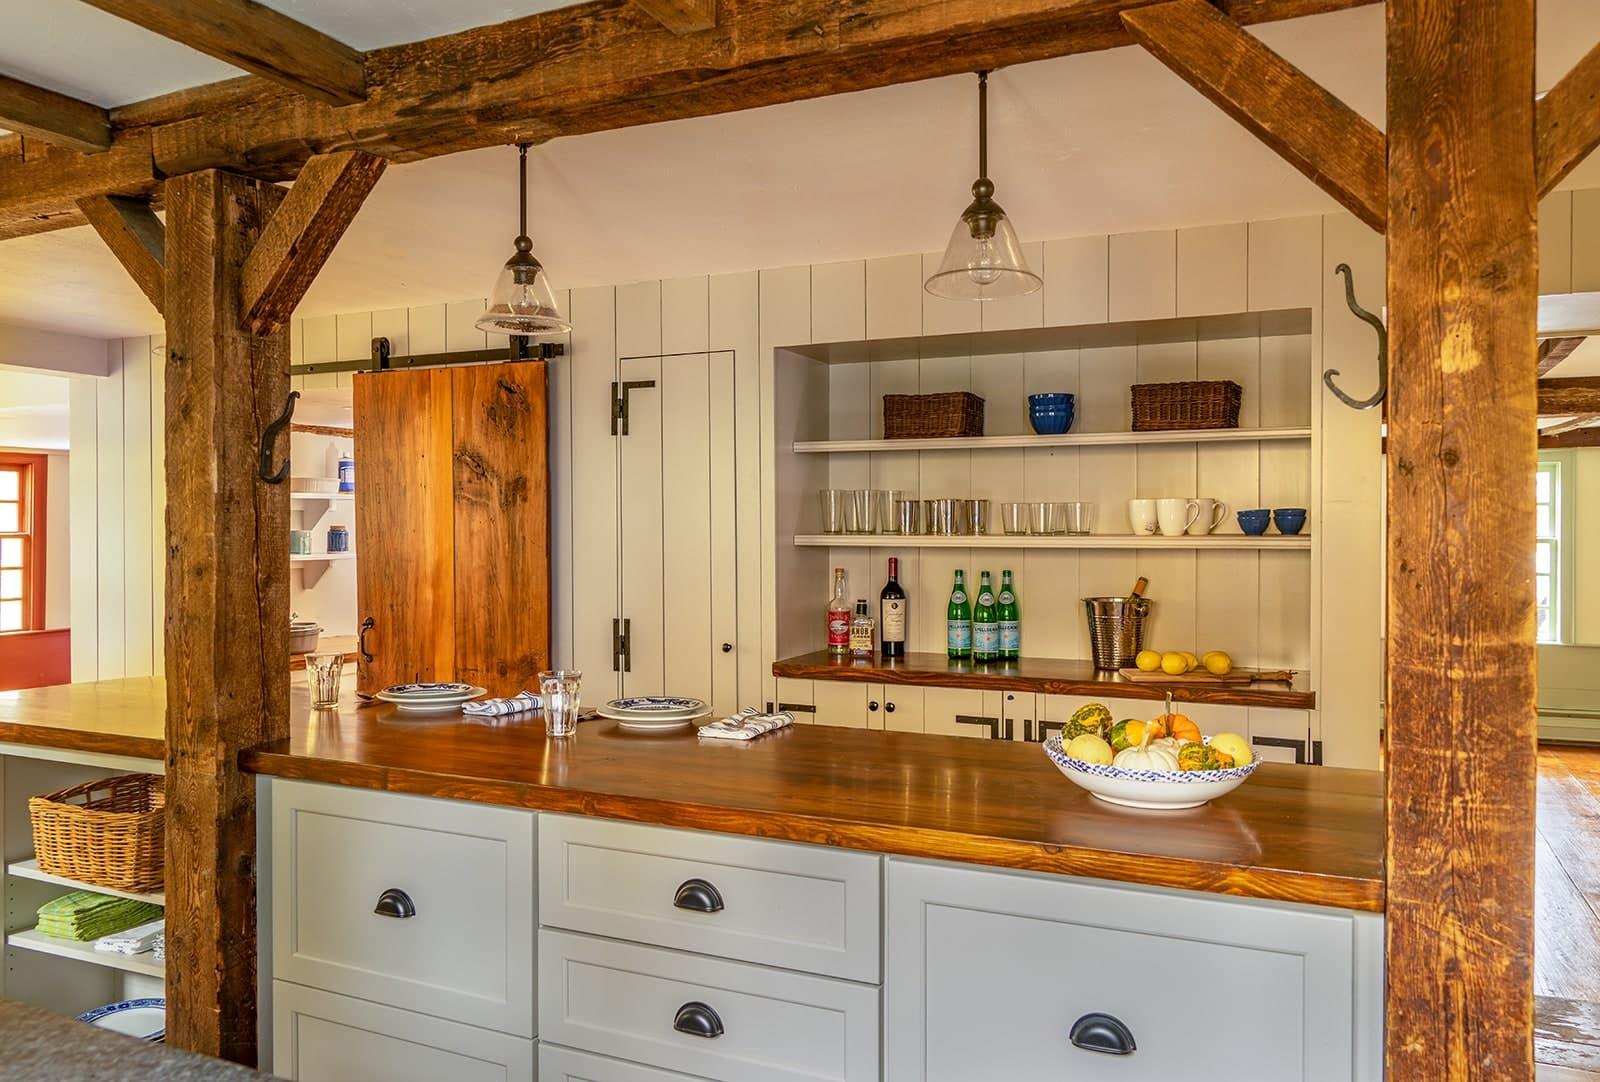 John Kimball Jr House Interiors Ipswich MA Kitchen